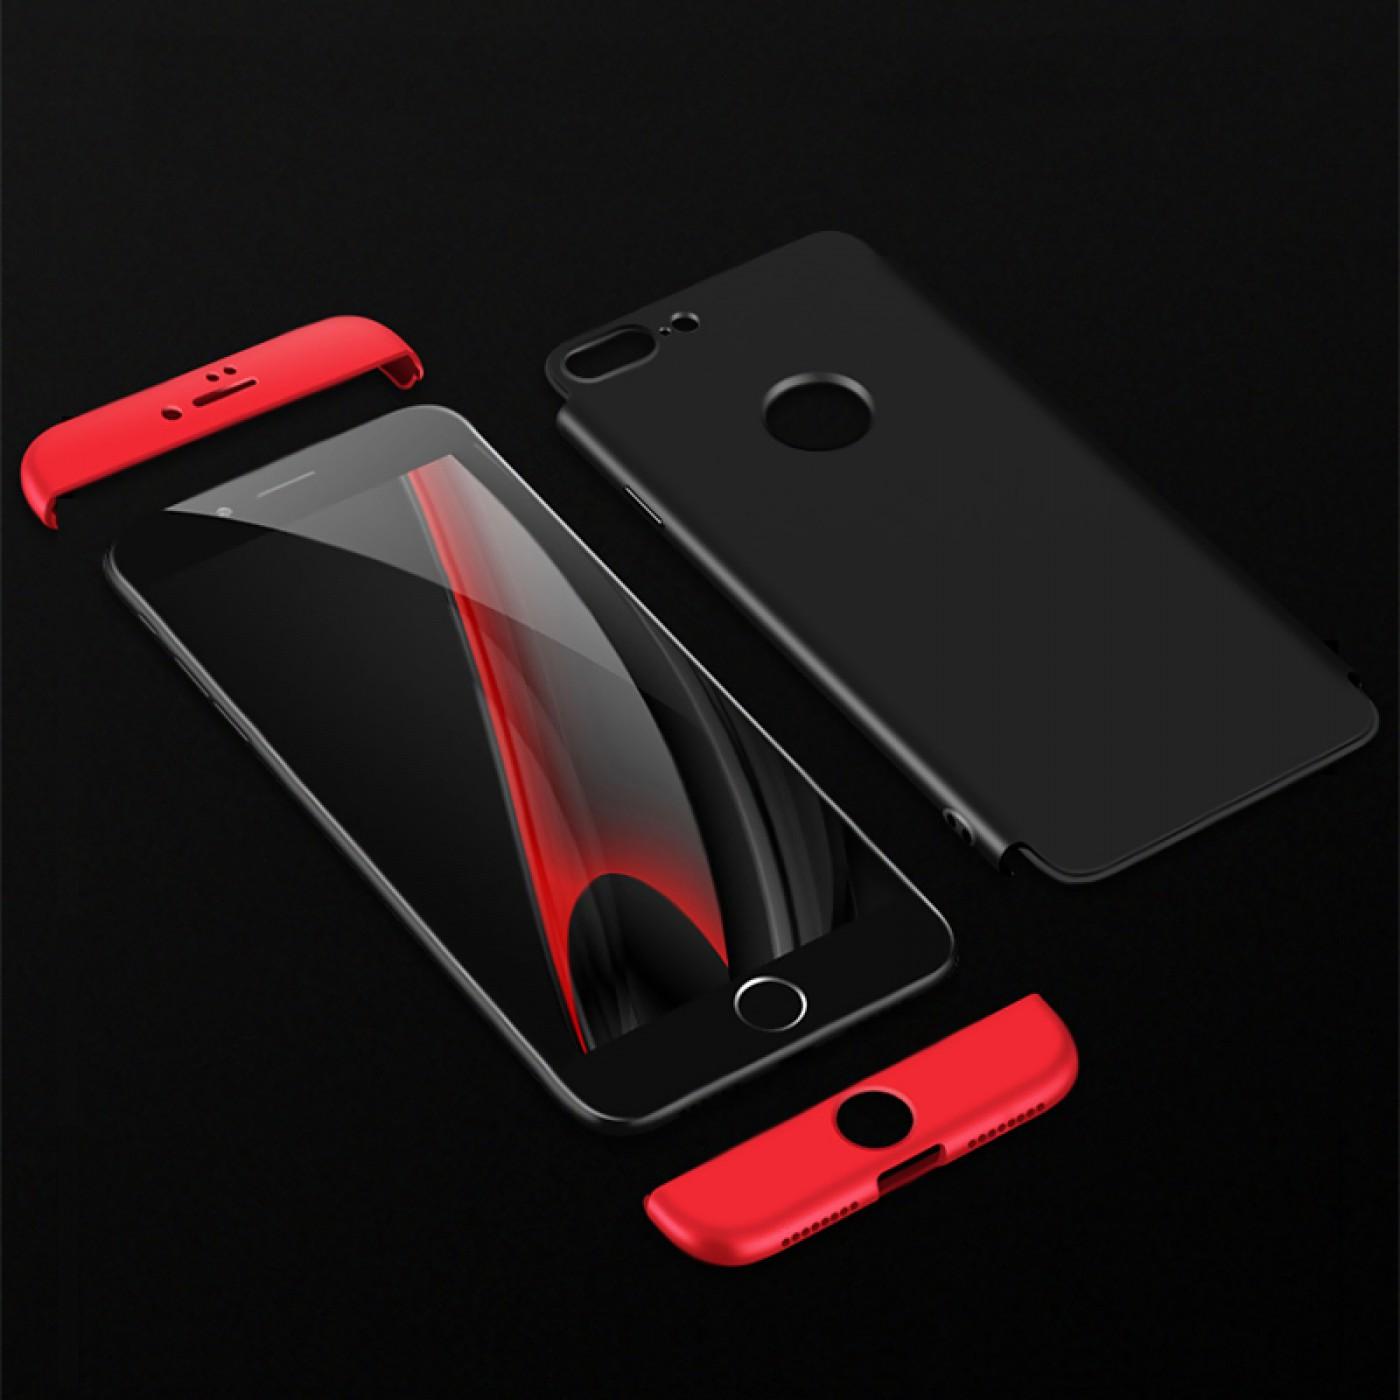 coque iphone 7 plus 8 plus 360 full body noir rouge. Black Bedroom Furniture Sets. Home Design Ideas